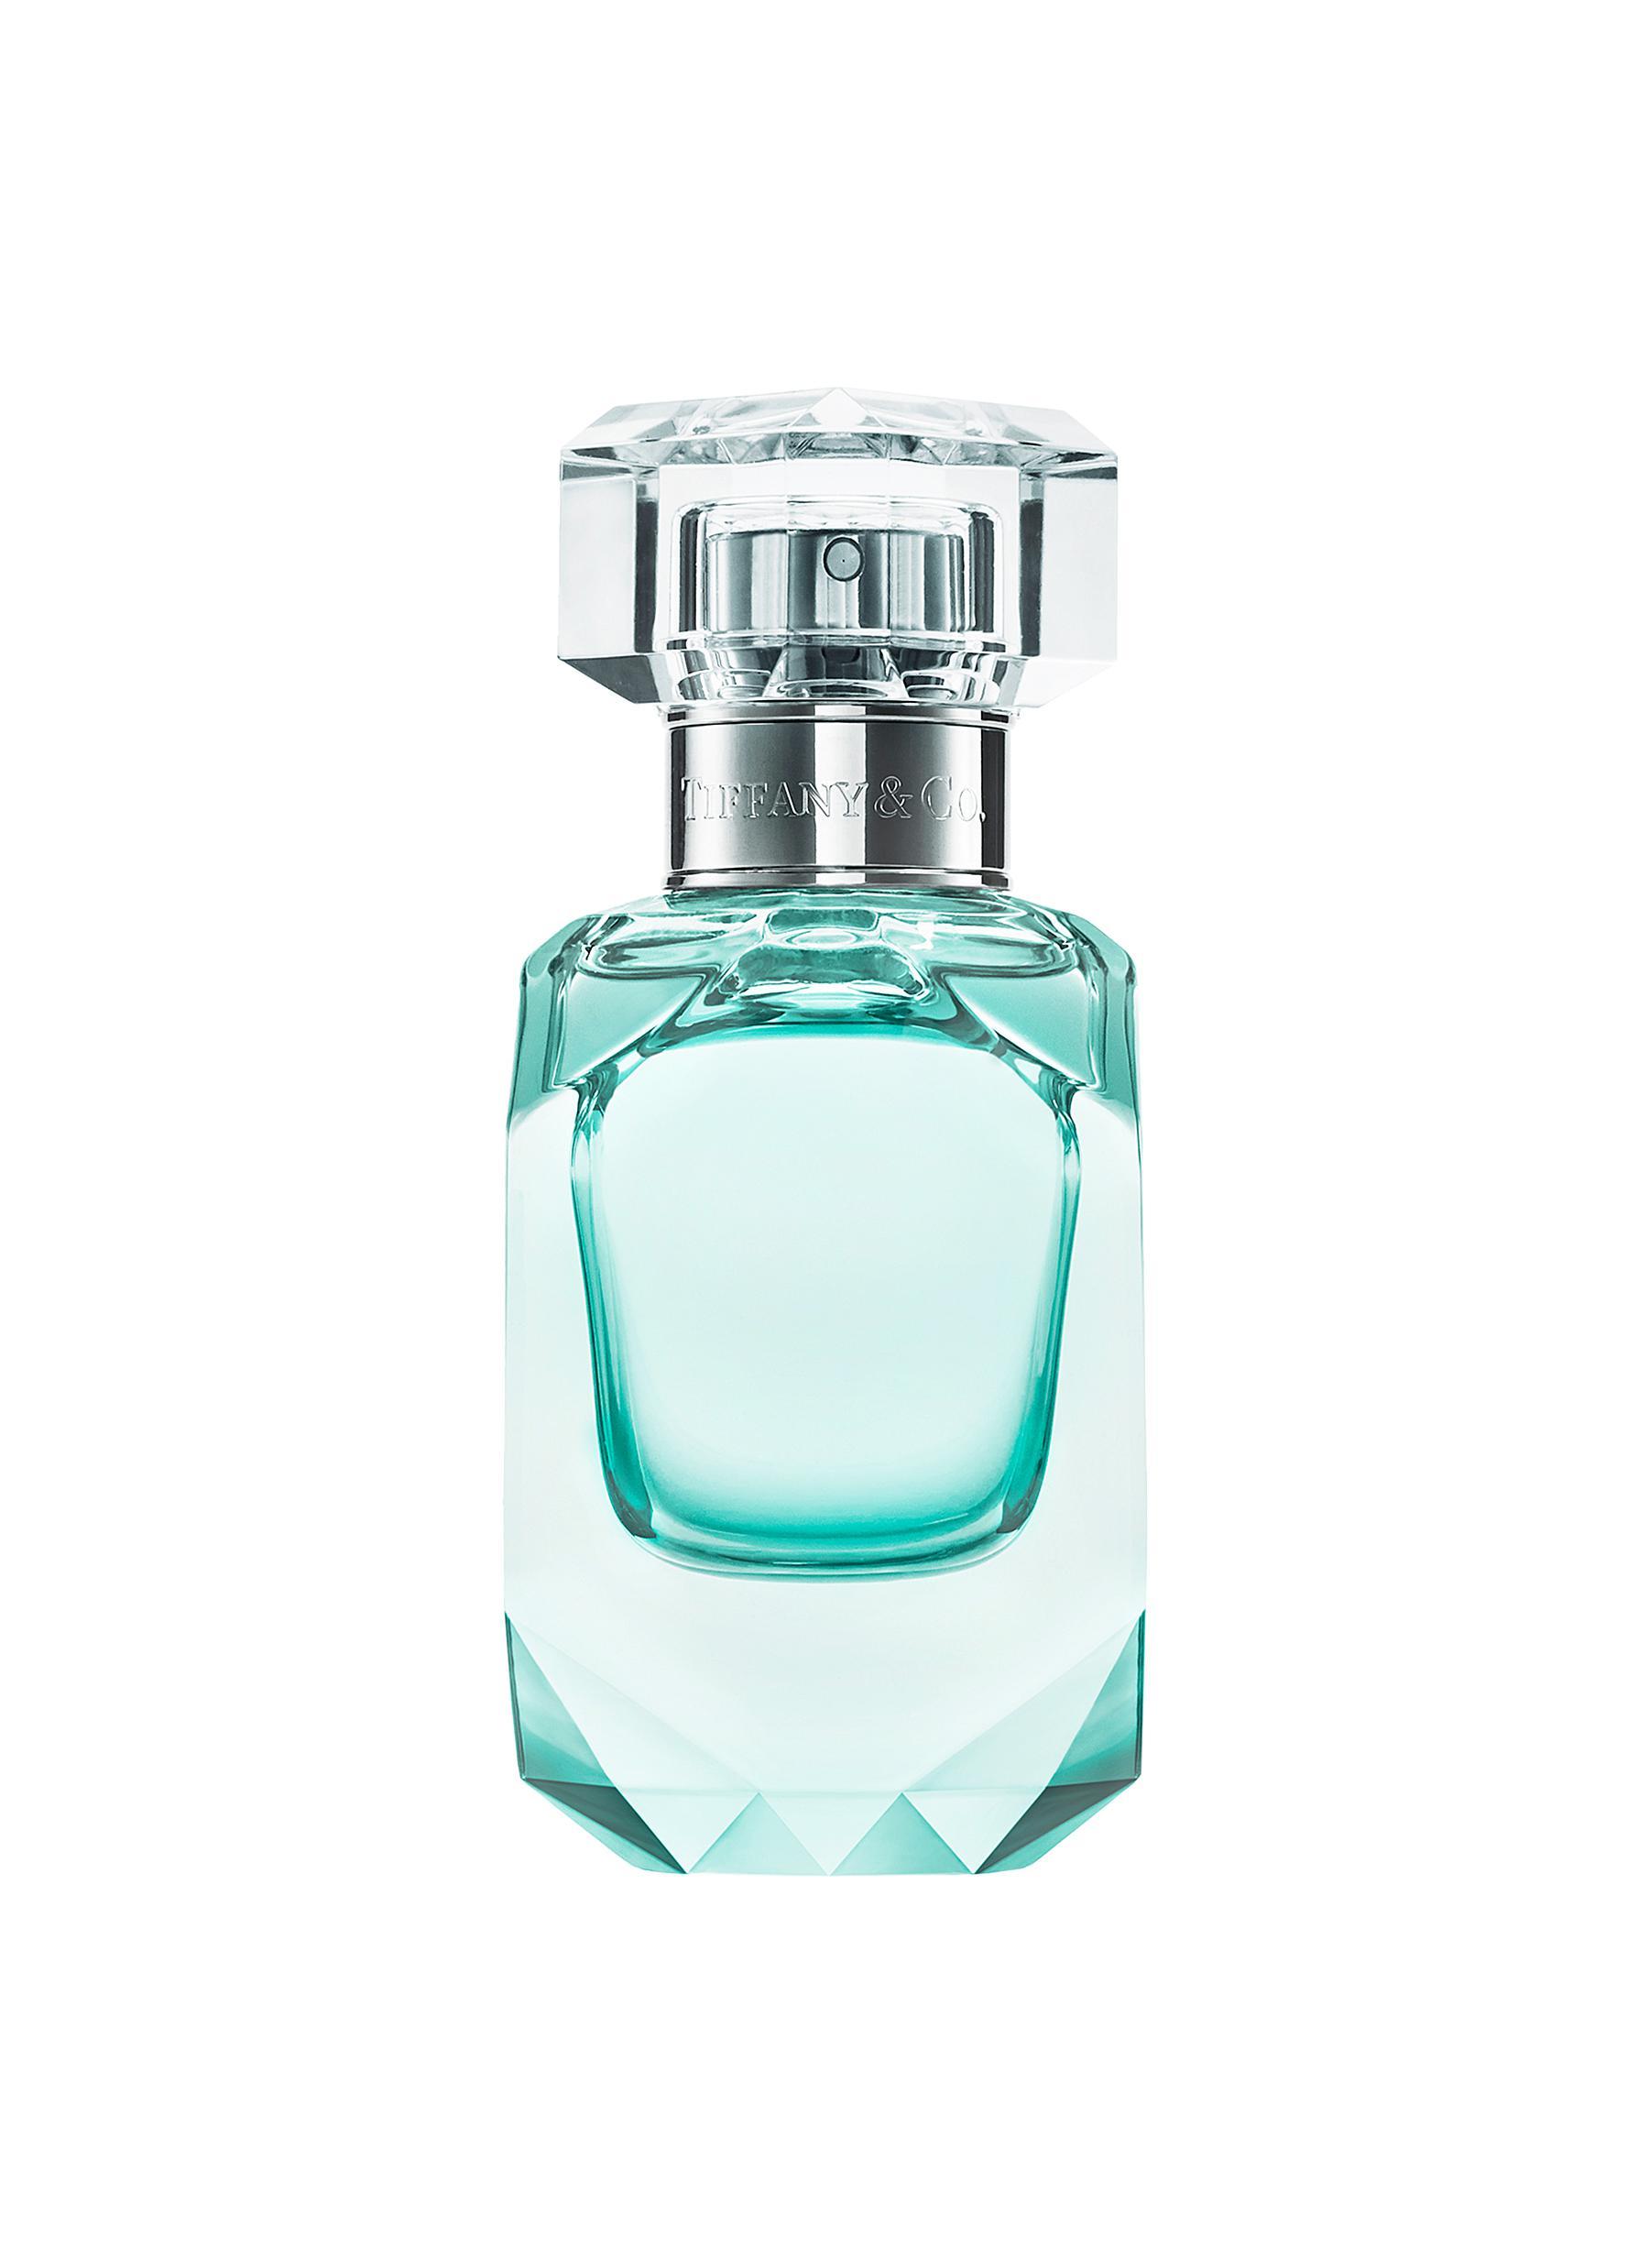 10d027c334 Main View - Click To Enlarge - Tiffany   Co. - Tiffany Eau de Parfum